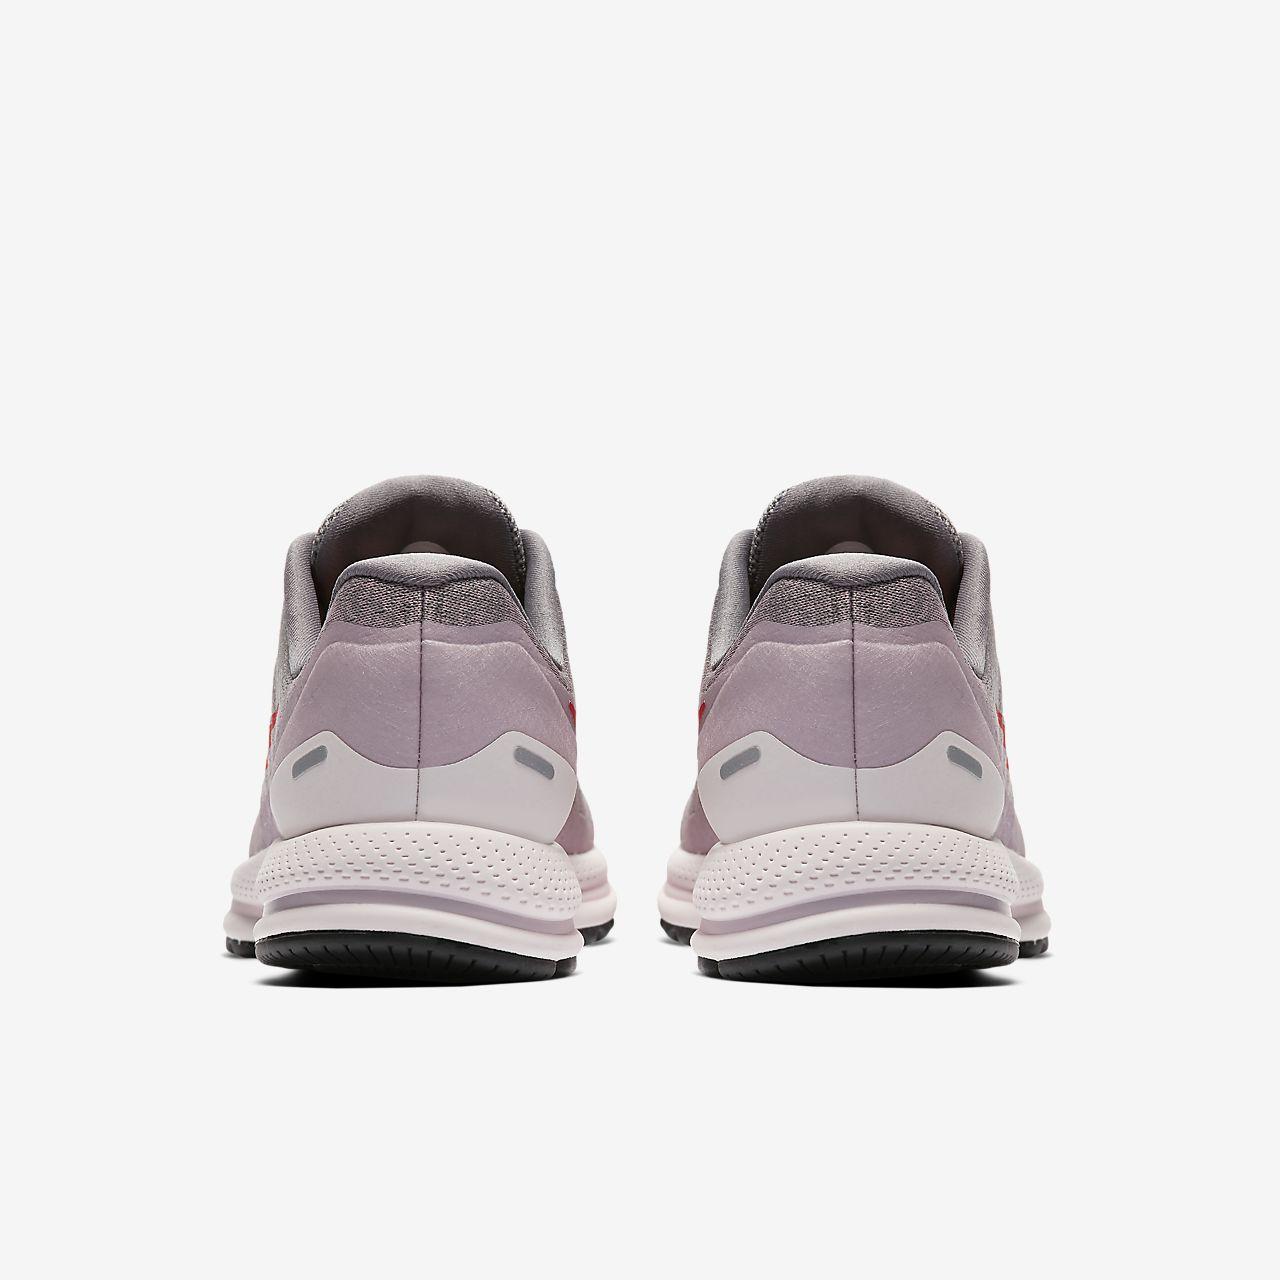 info for bbda8 1d75c ... Nike Air Zoom Vomero 13 Womens Running Shoe